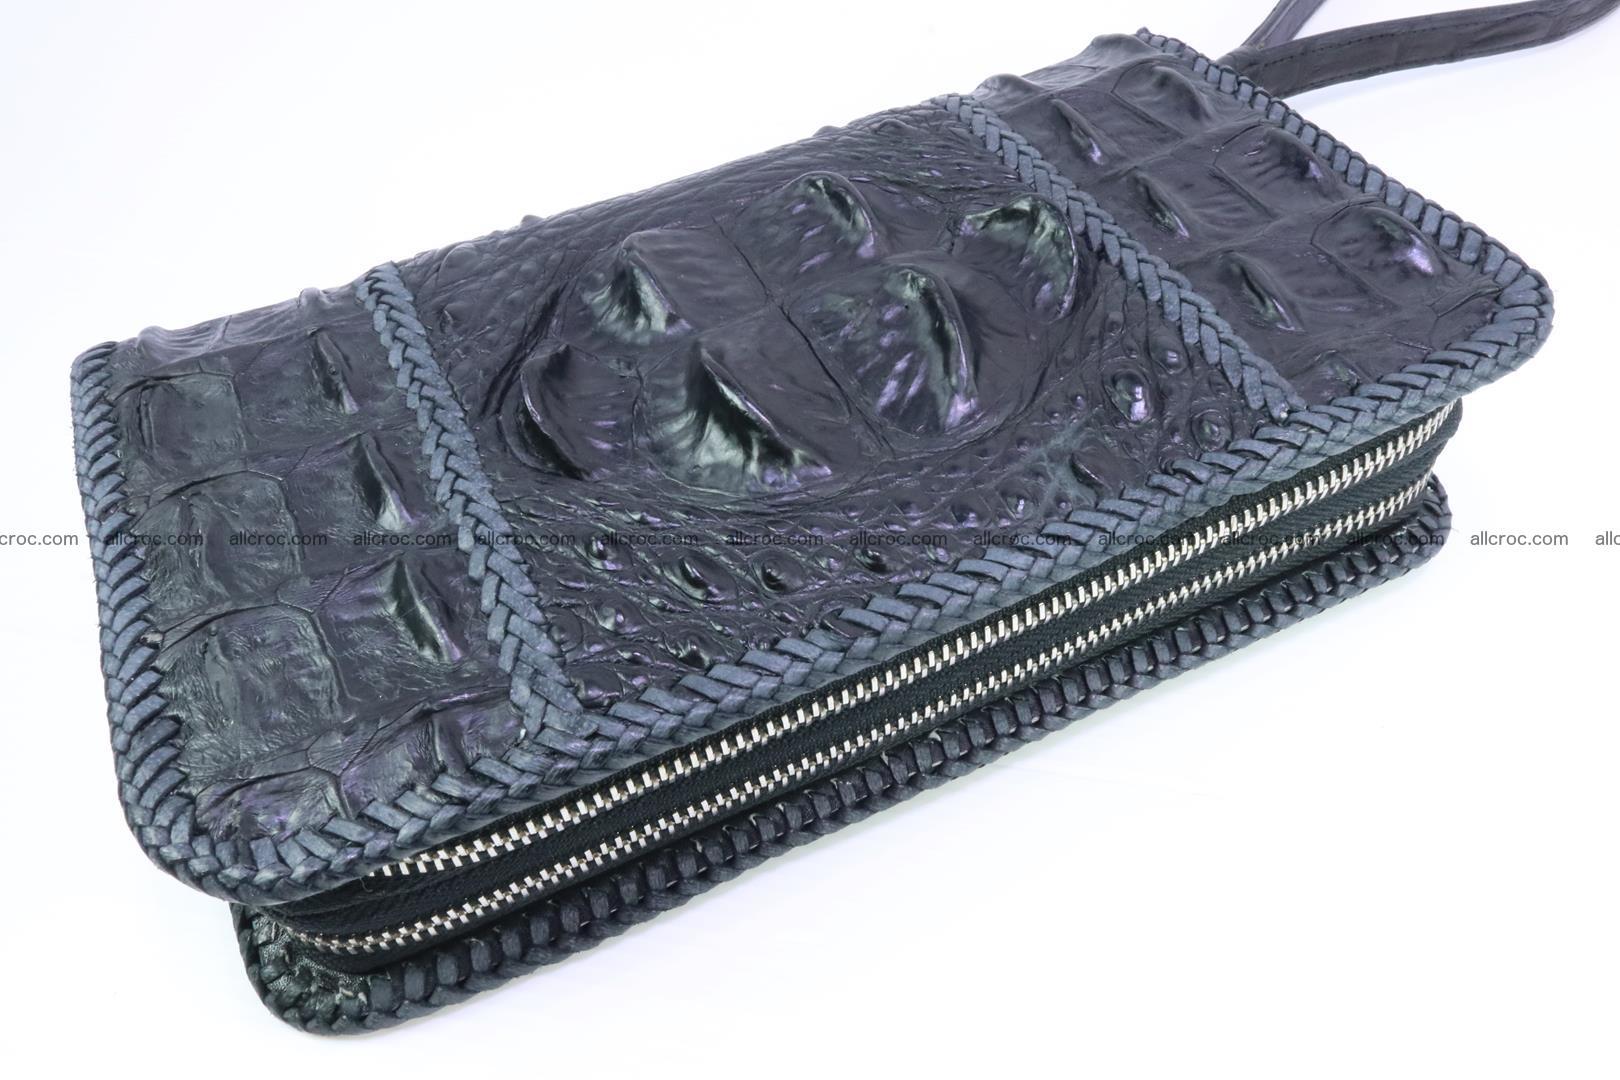 Crocodile clutch for men from genuine hornback crocodile leather 160 Foto 0